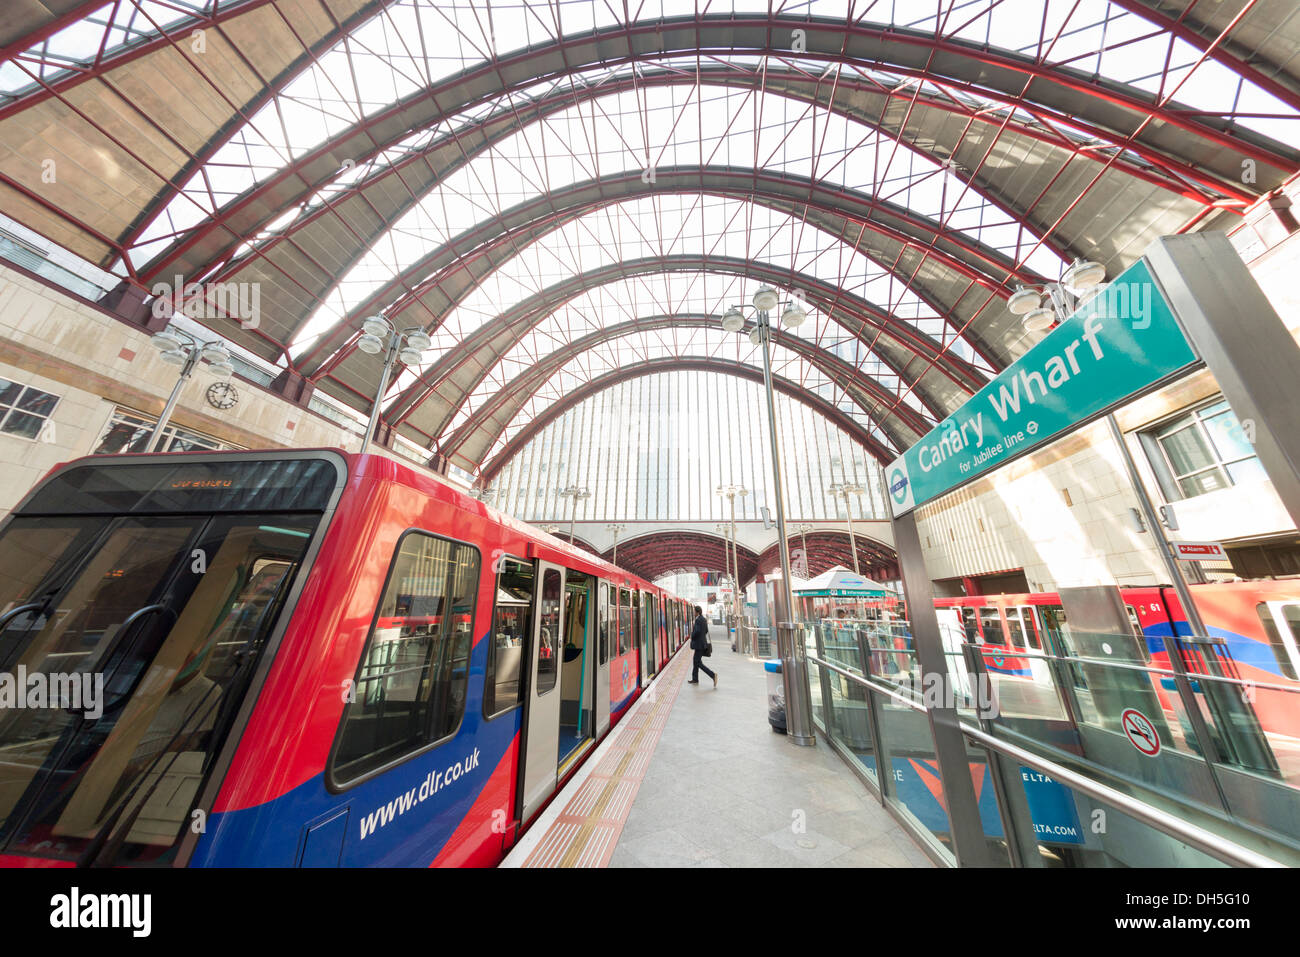 Docklands Light Railway station at Canary Wharf, London, England, UK - Stock Image